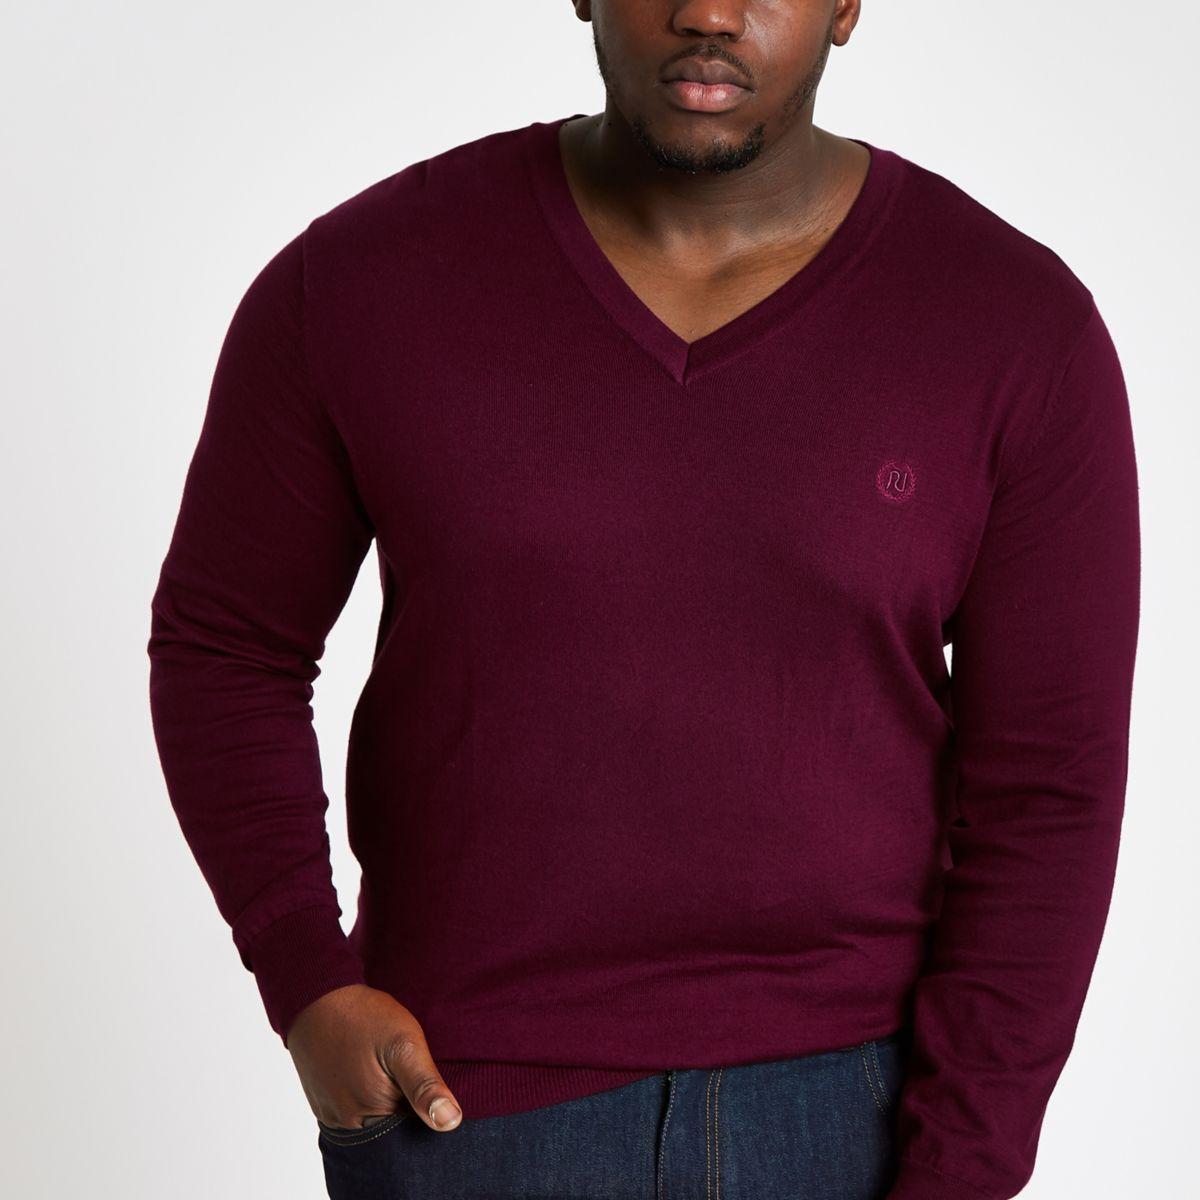 Big & Tall slim fit burgundy v neck sweater